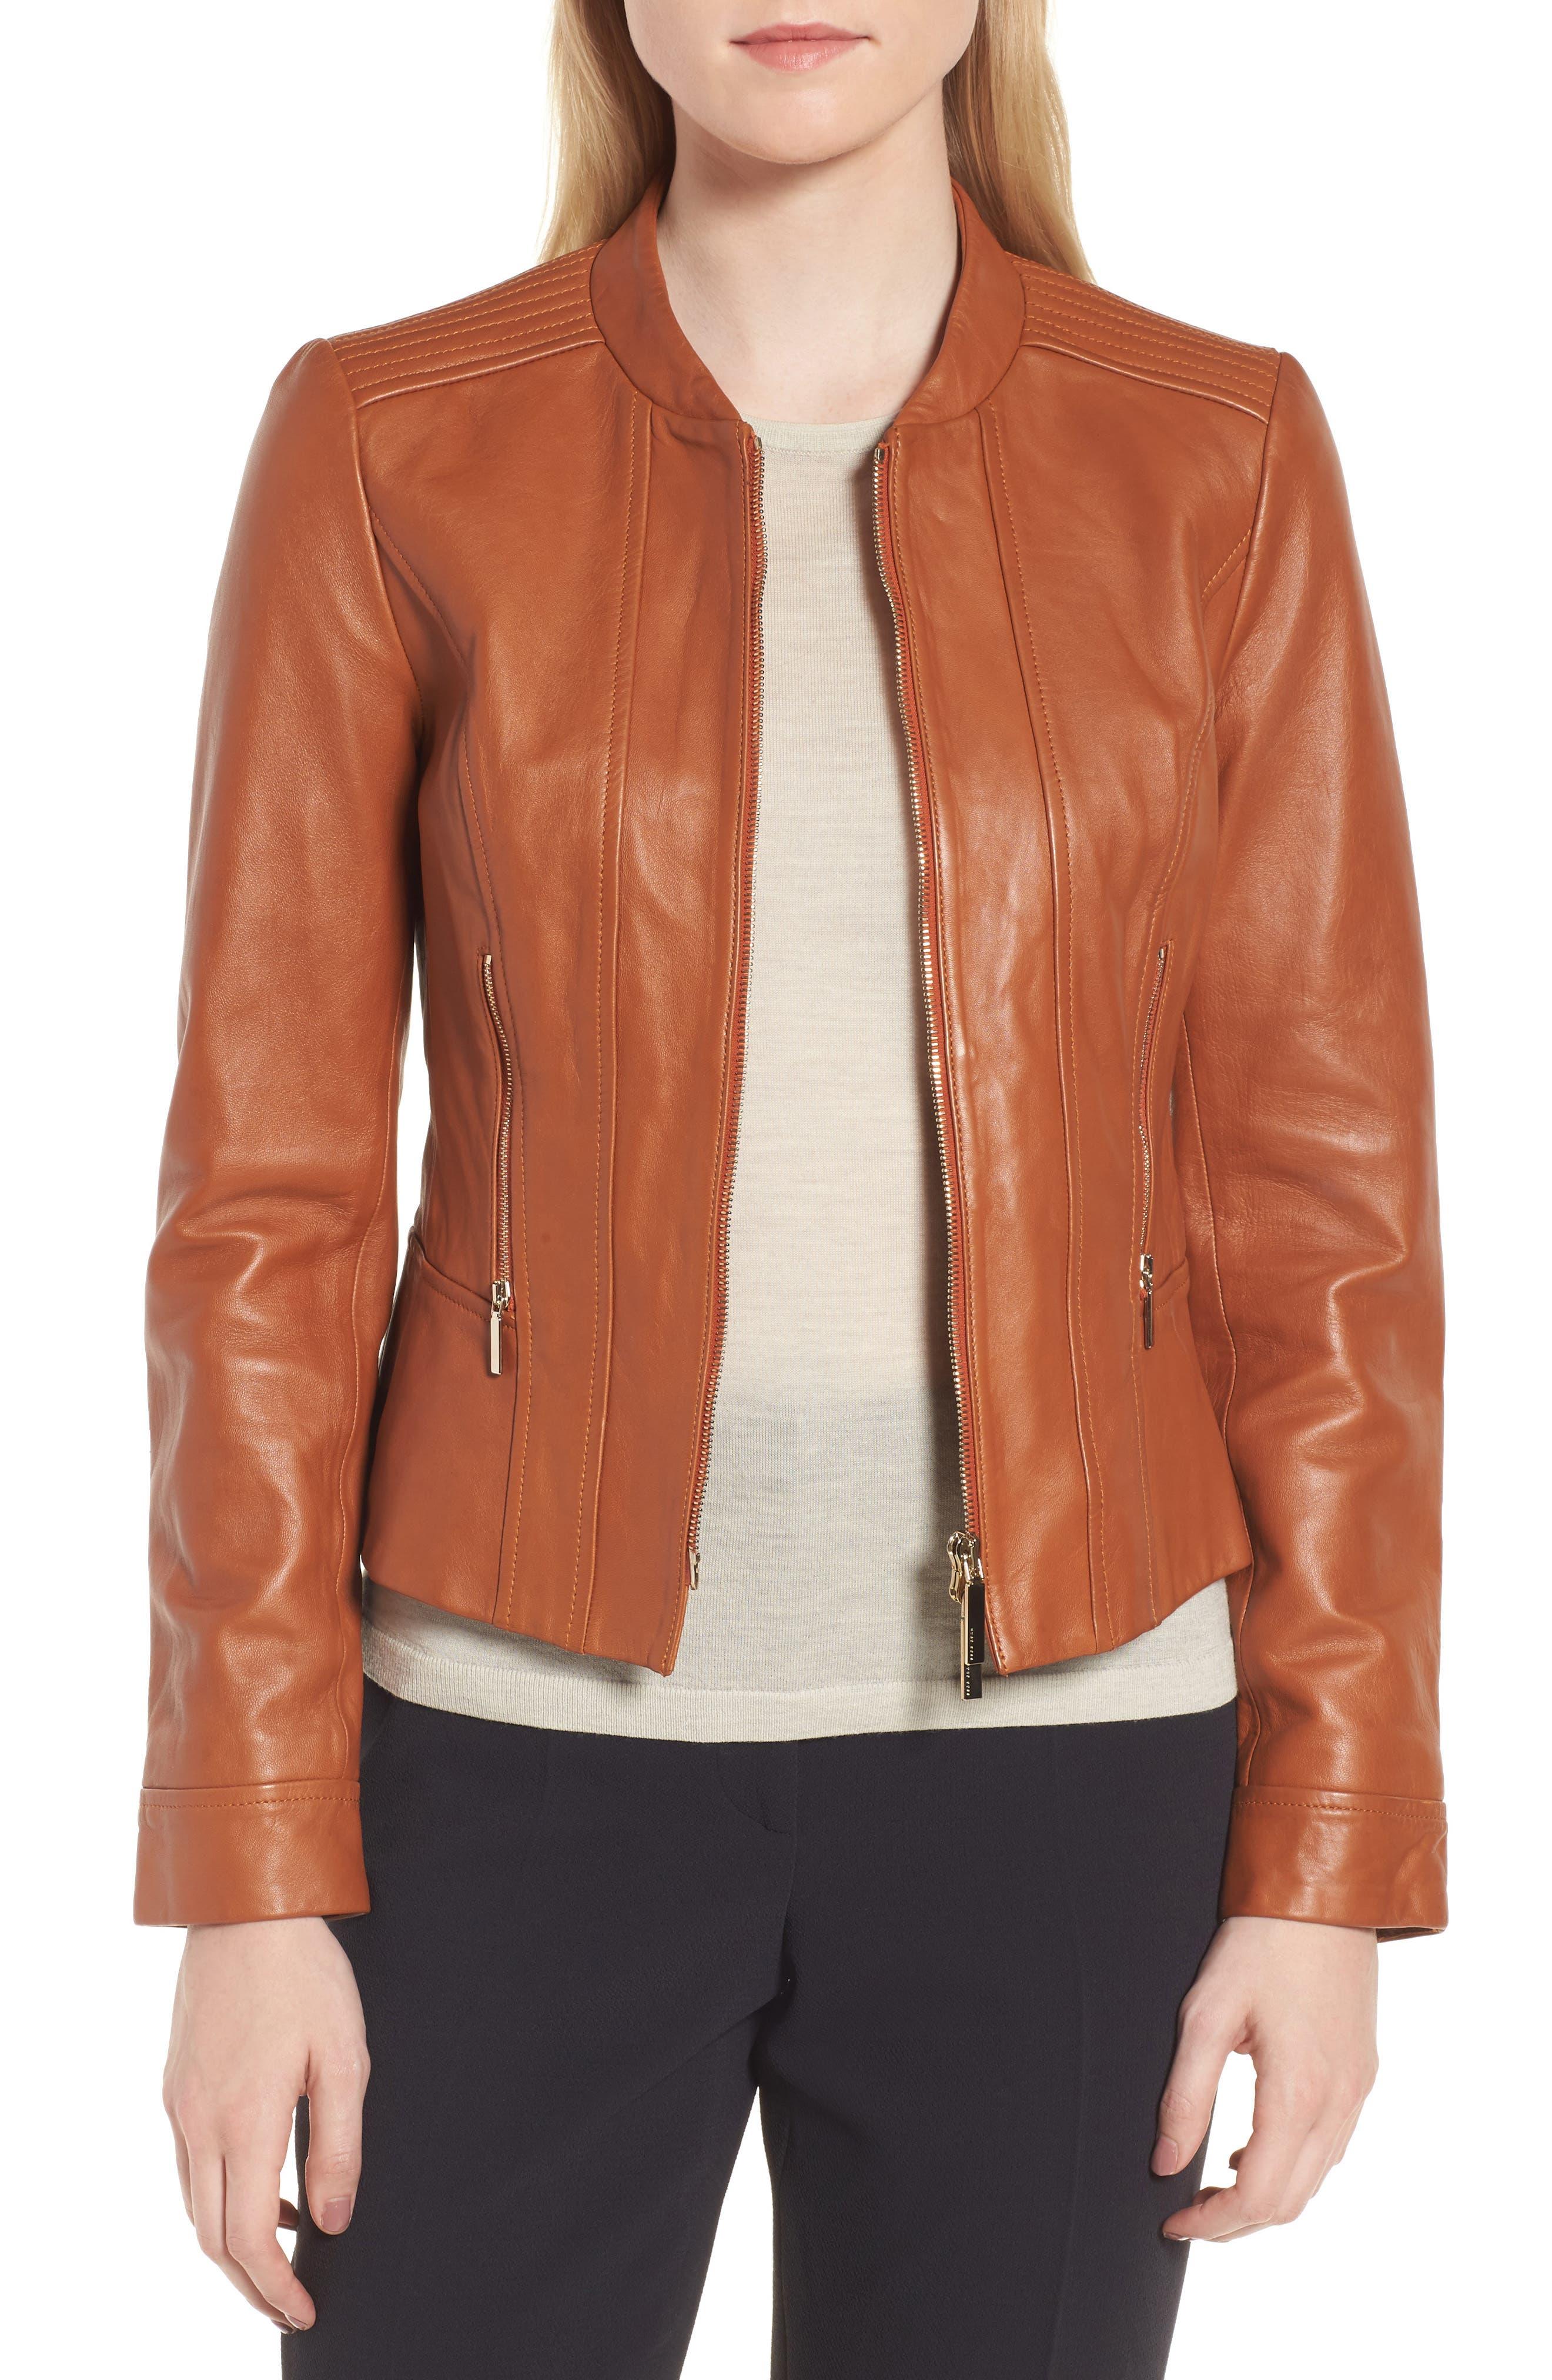 Sabiza Leather Jacket,                         Main,                         color, Brass